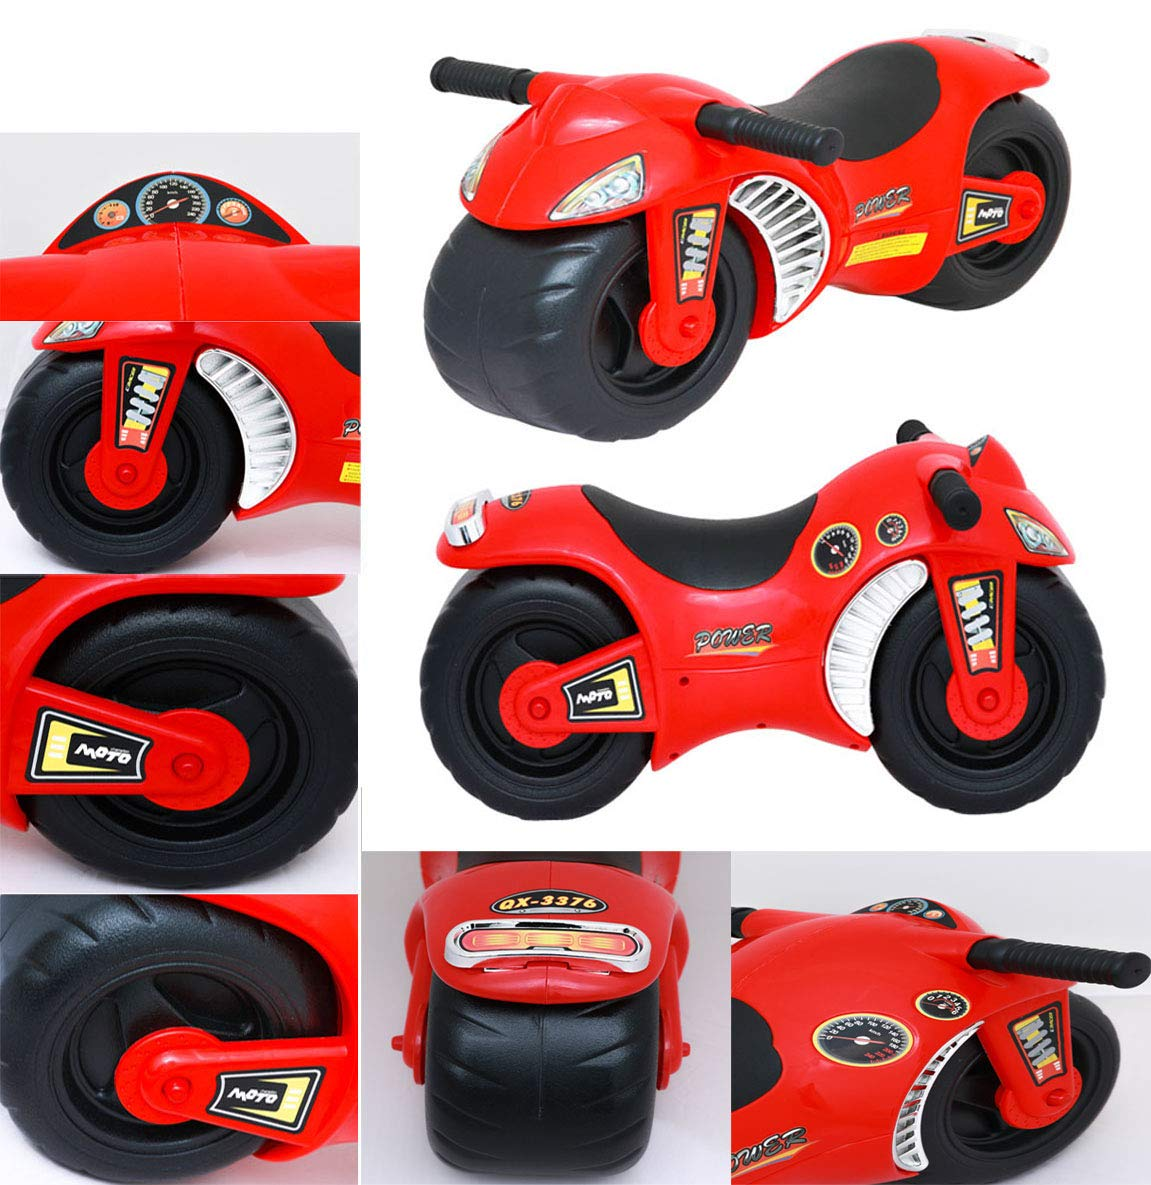 Denny International Ride On Balance Bike for Toddler Kids Motorbike Motorcycle Car Walker Push Along Ride On